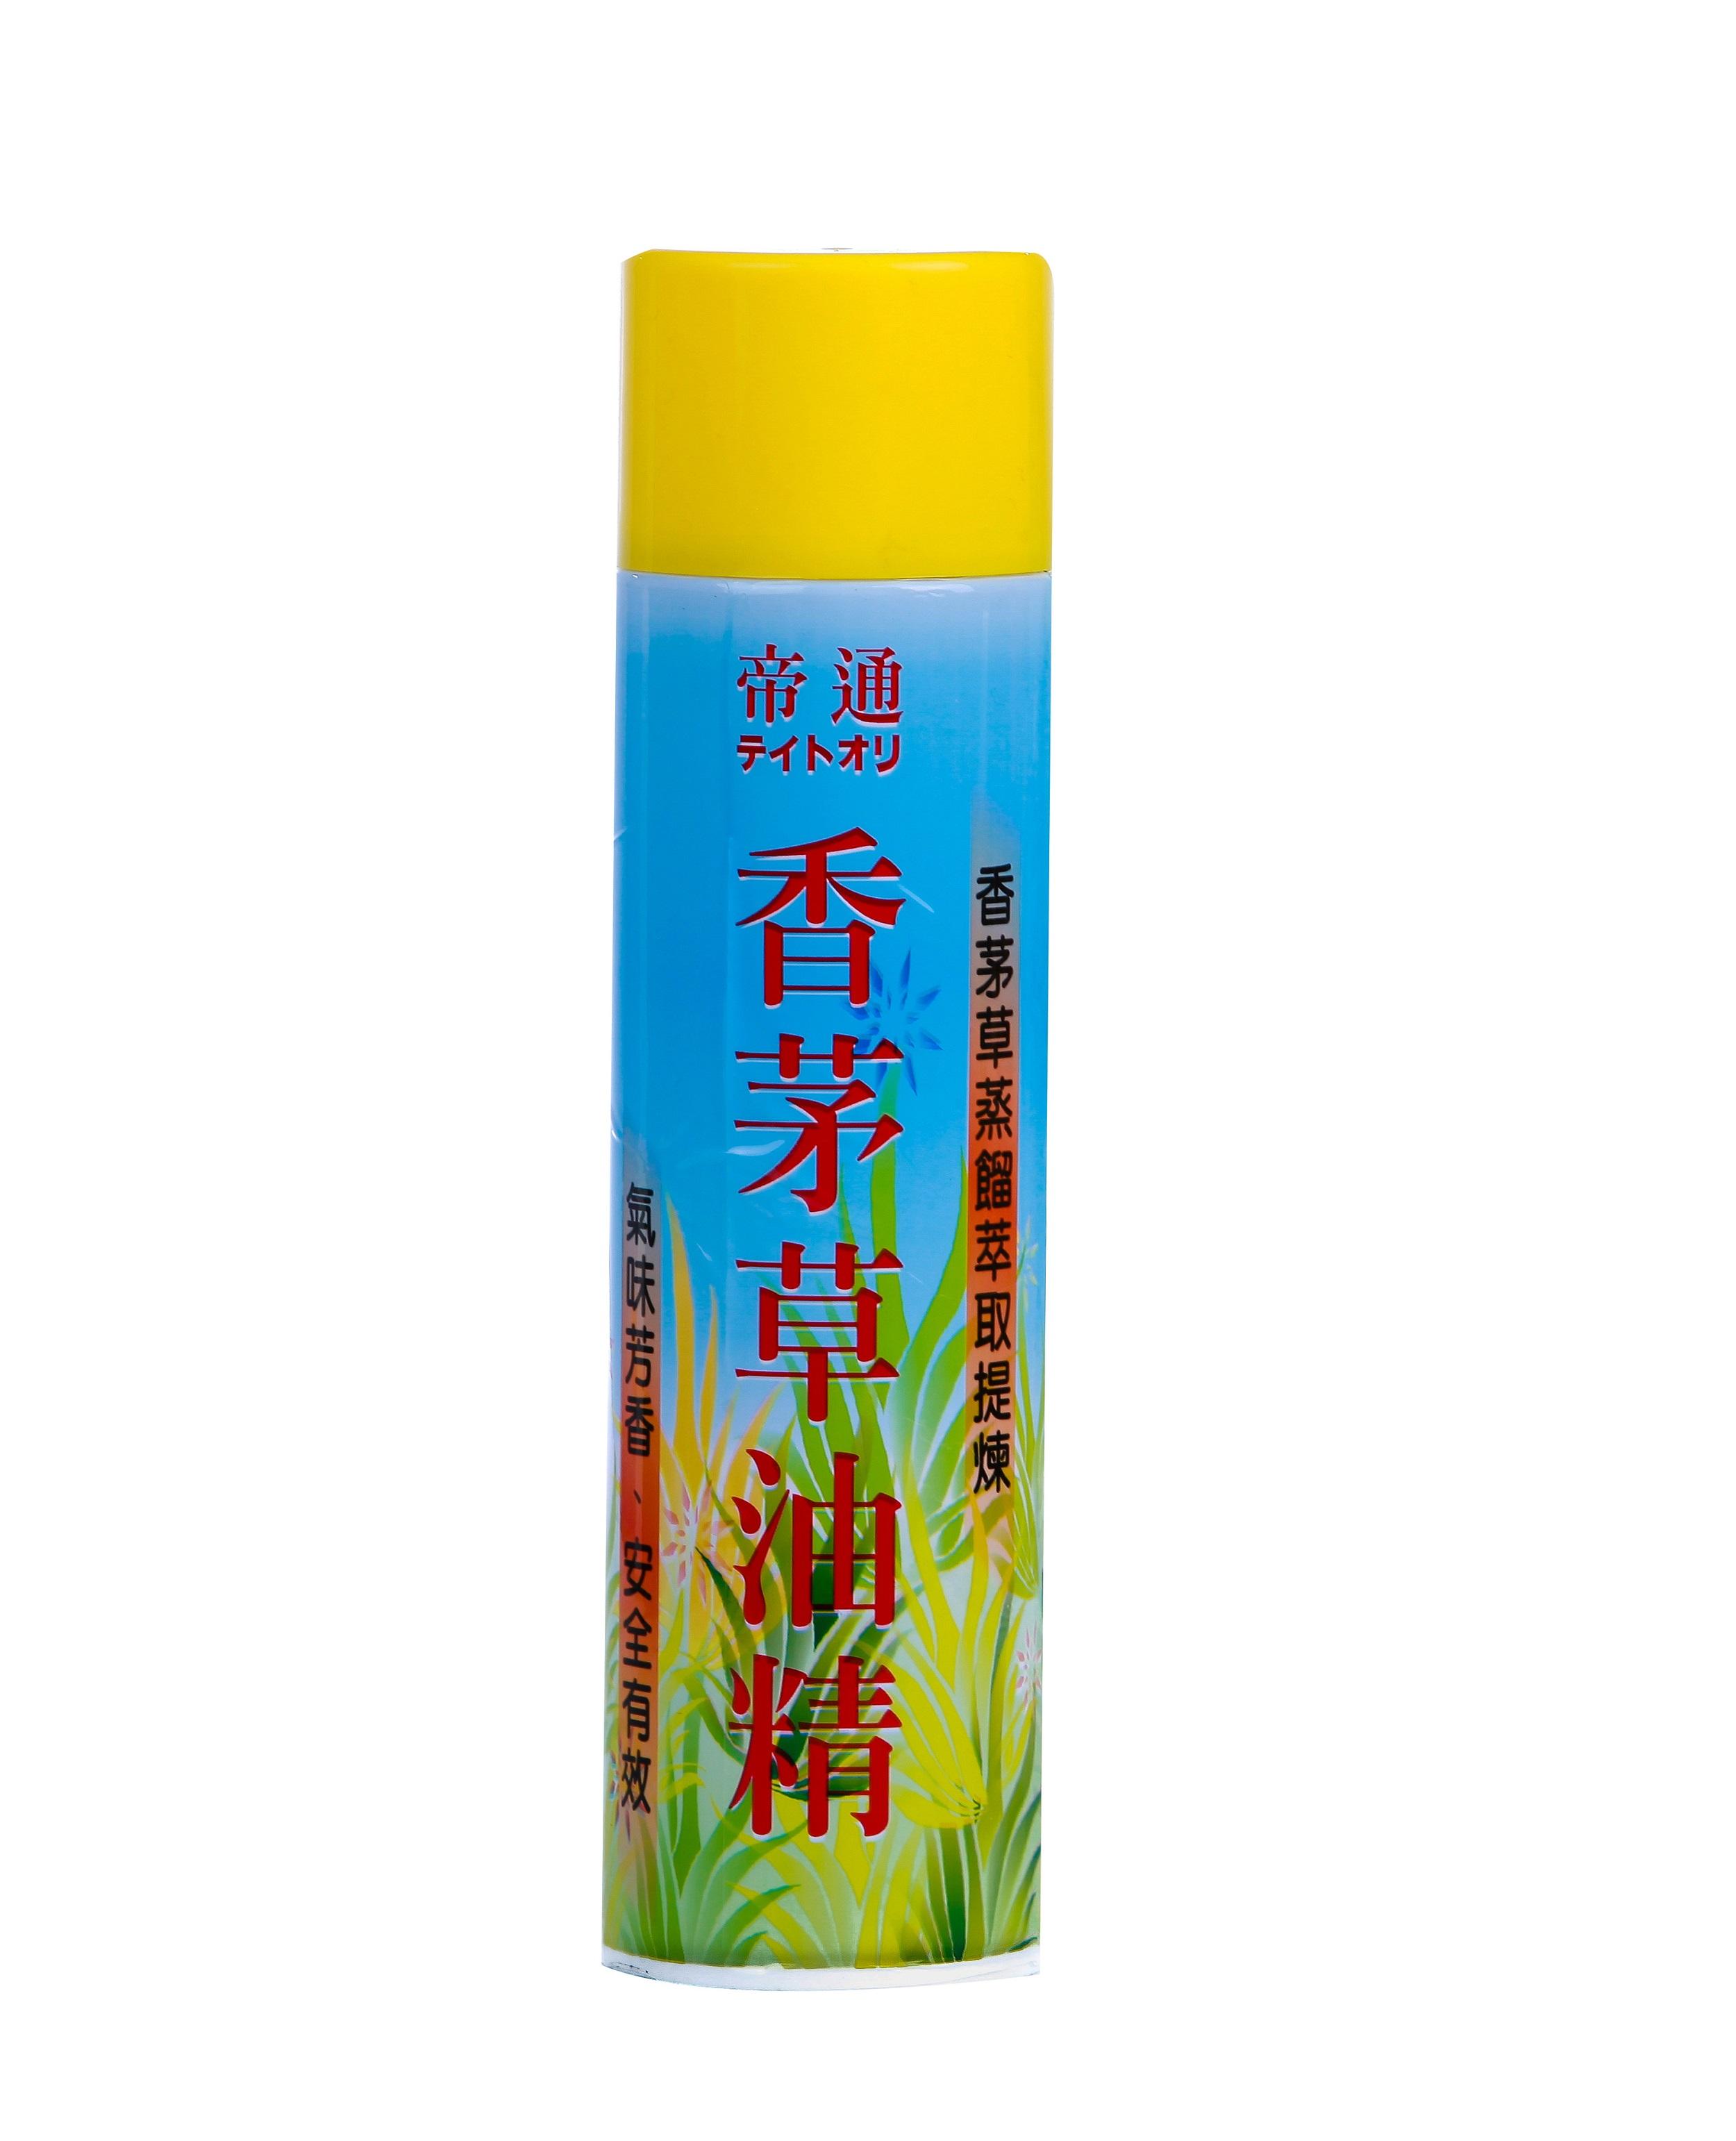 帝通香茅草油精Citronella Oil